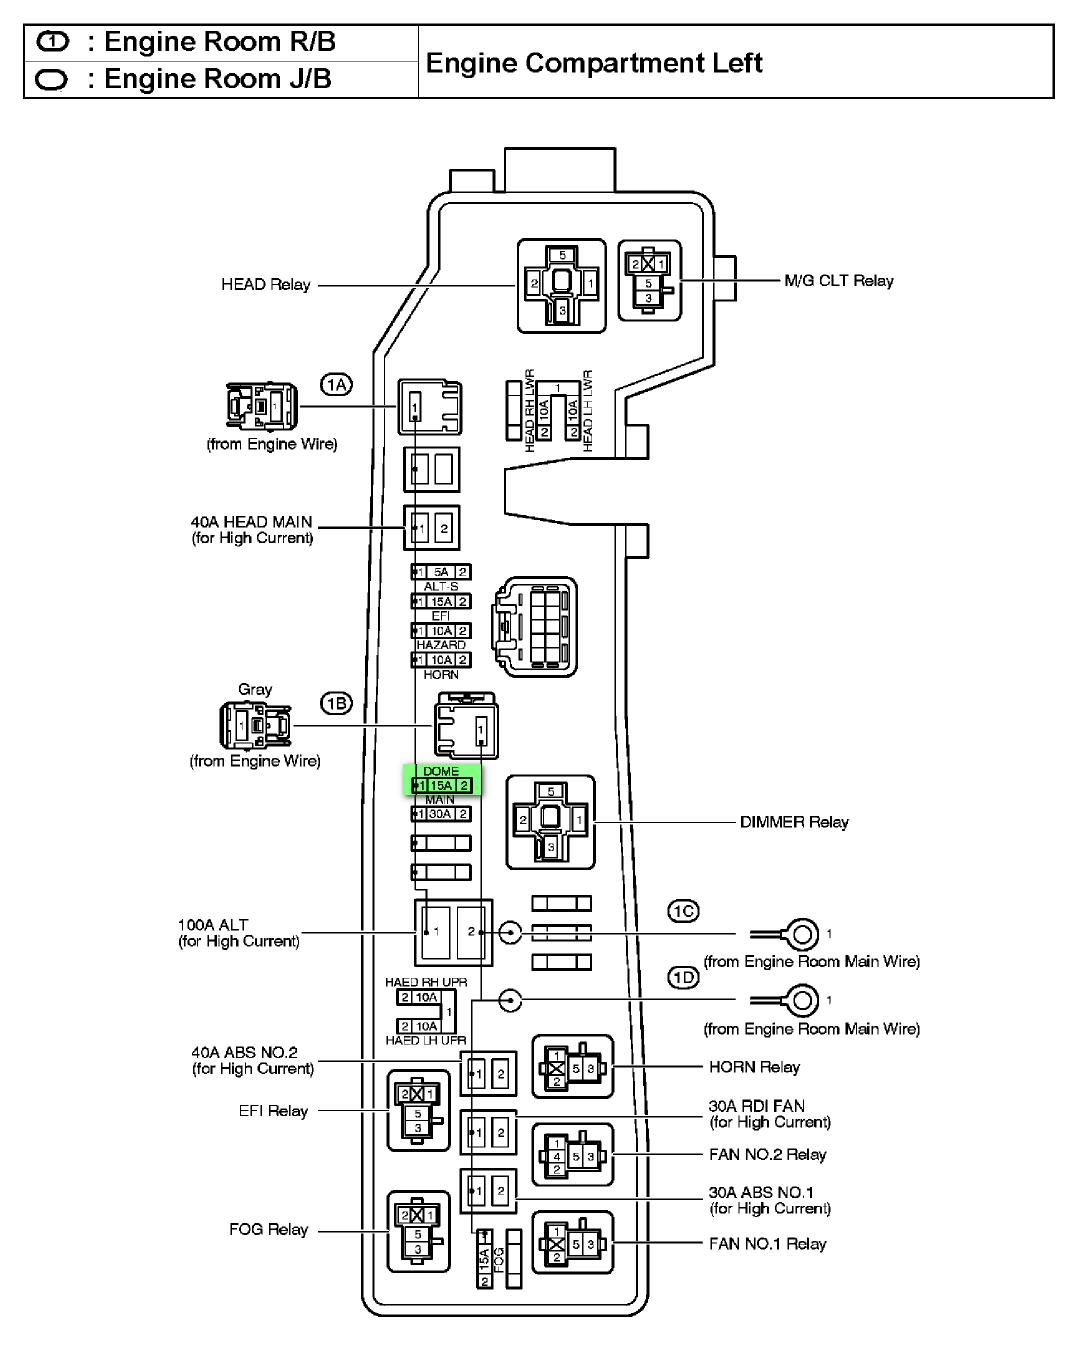 wiring diagram of toyota innova wiring diagram rh gregmadison co Thermostat Wiring Diagram Home AC Wiring Diagram